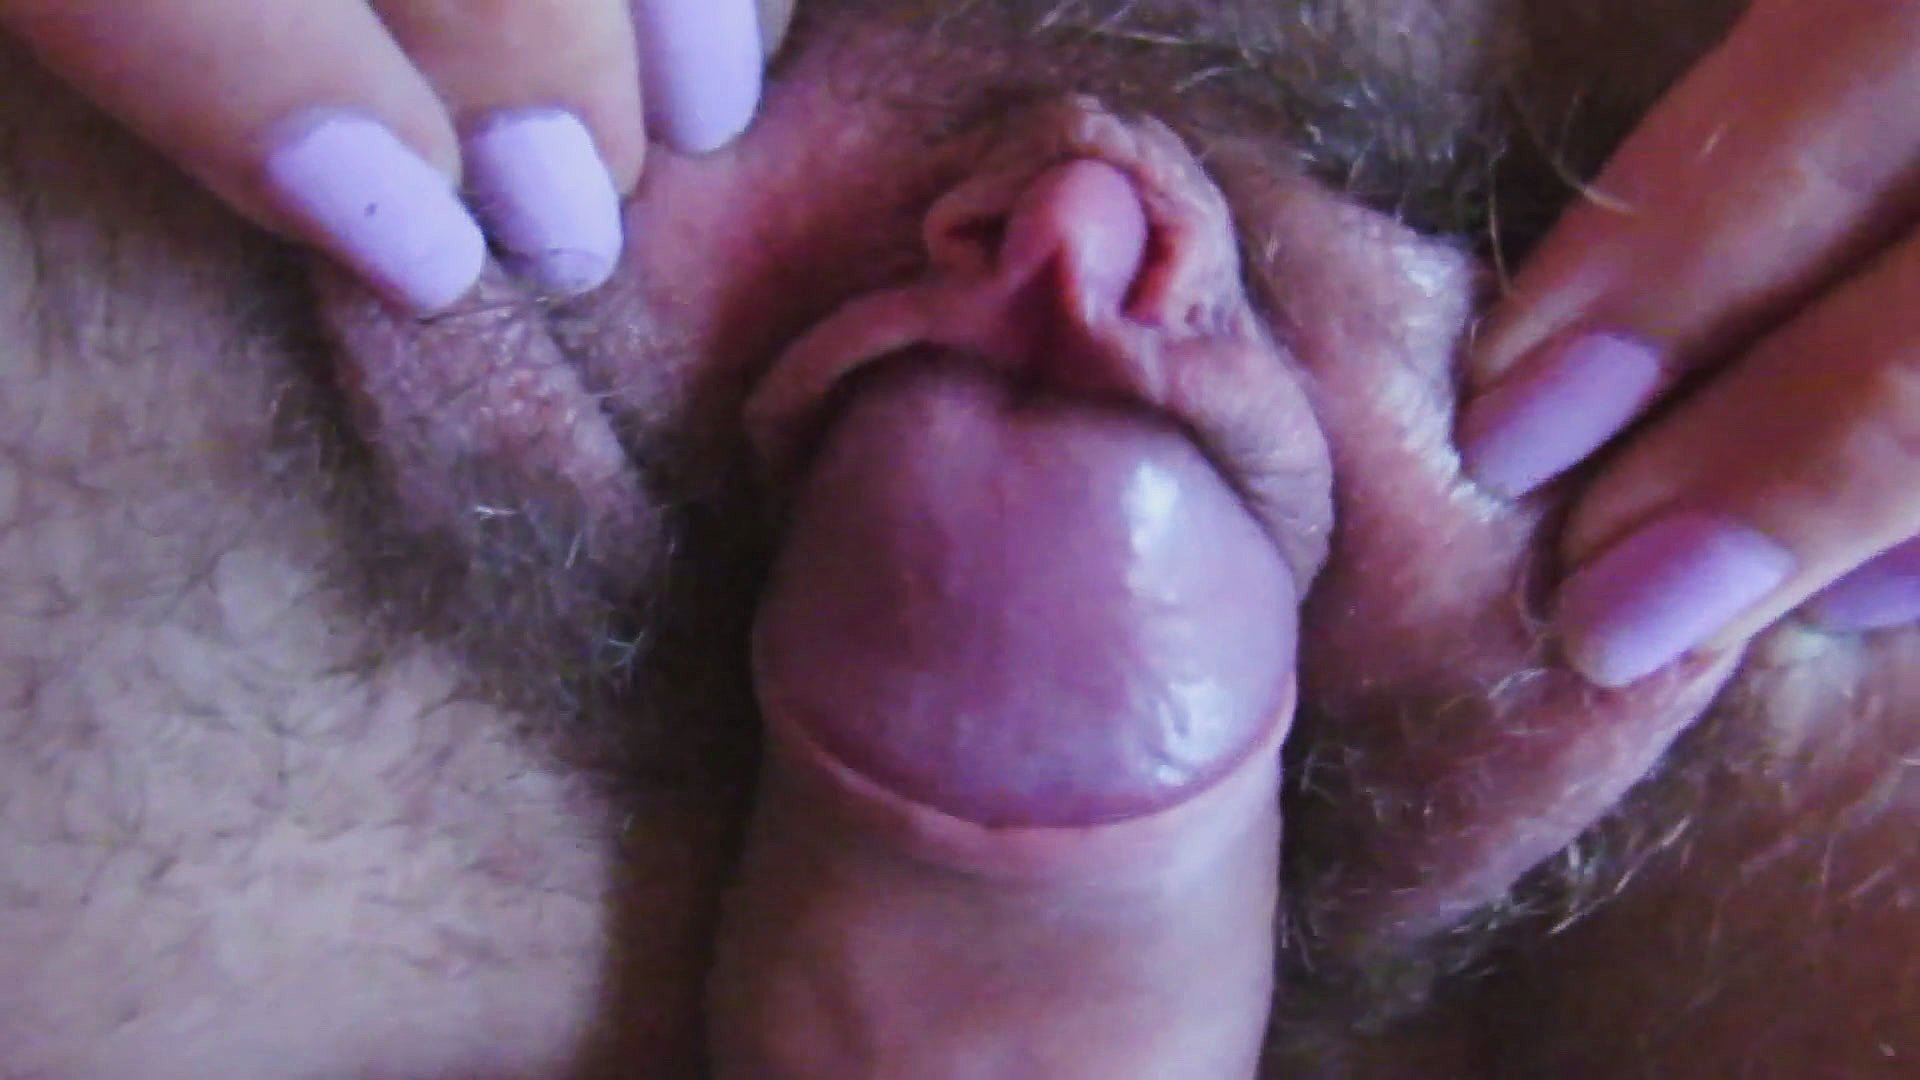 cockhead sperm Swelling labia